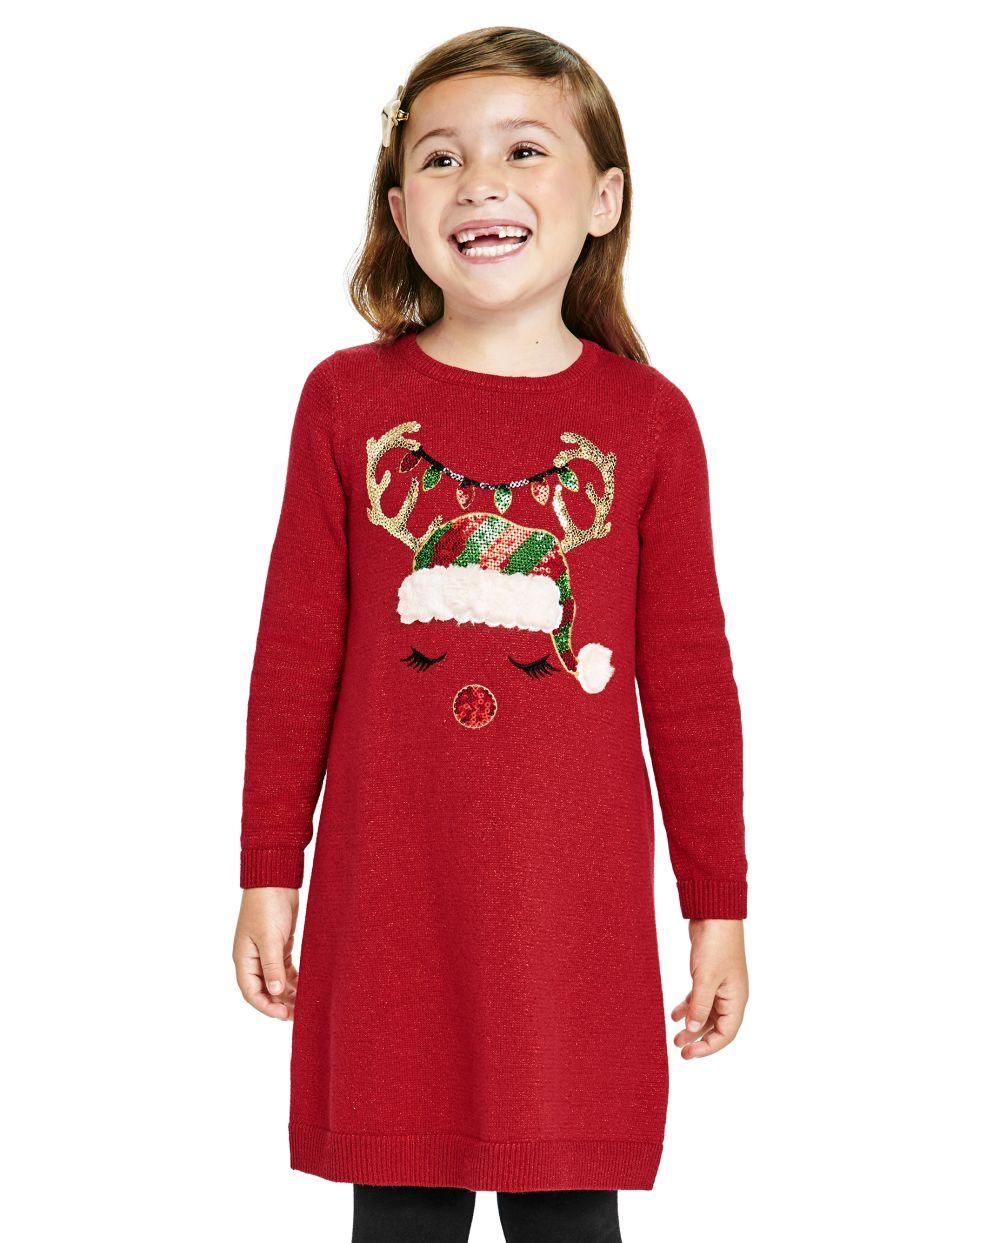 Toddler Baby Sweater Dress